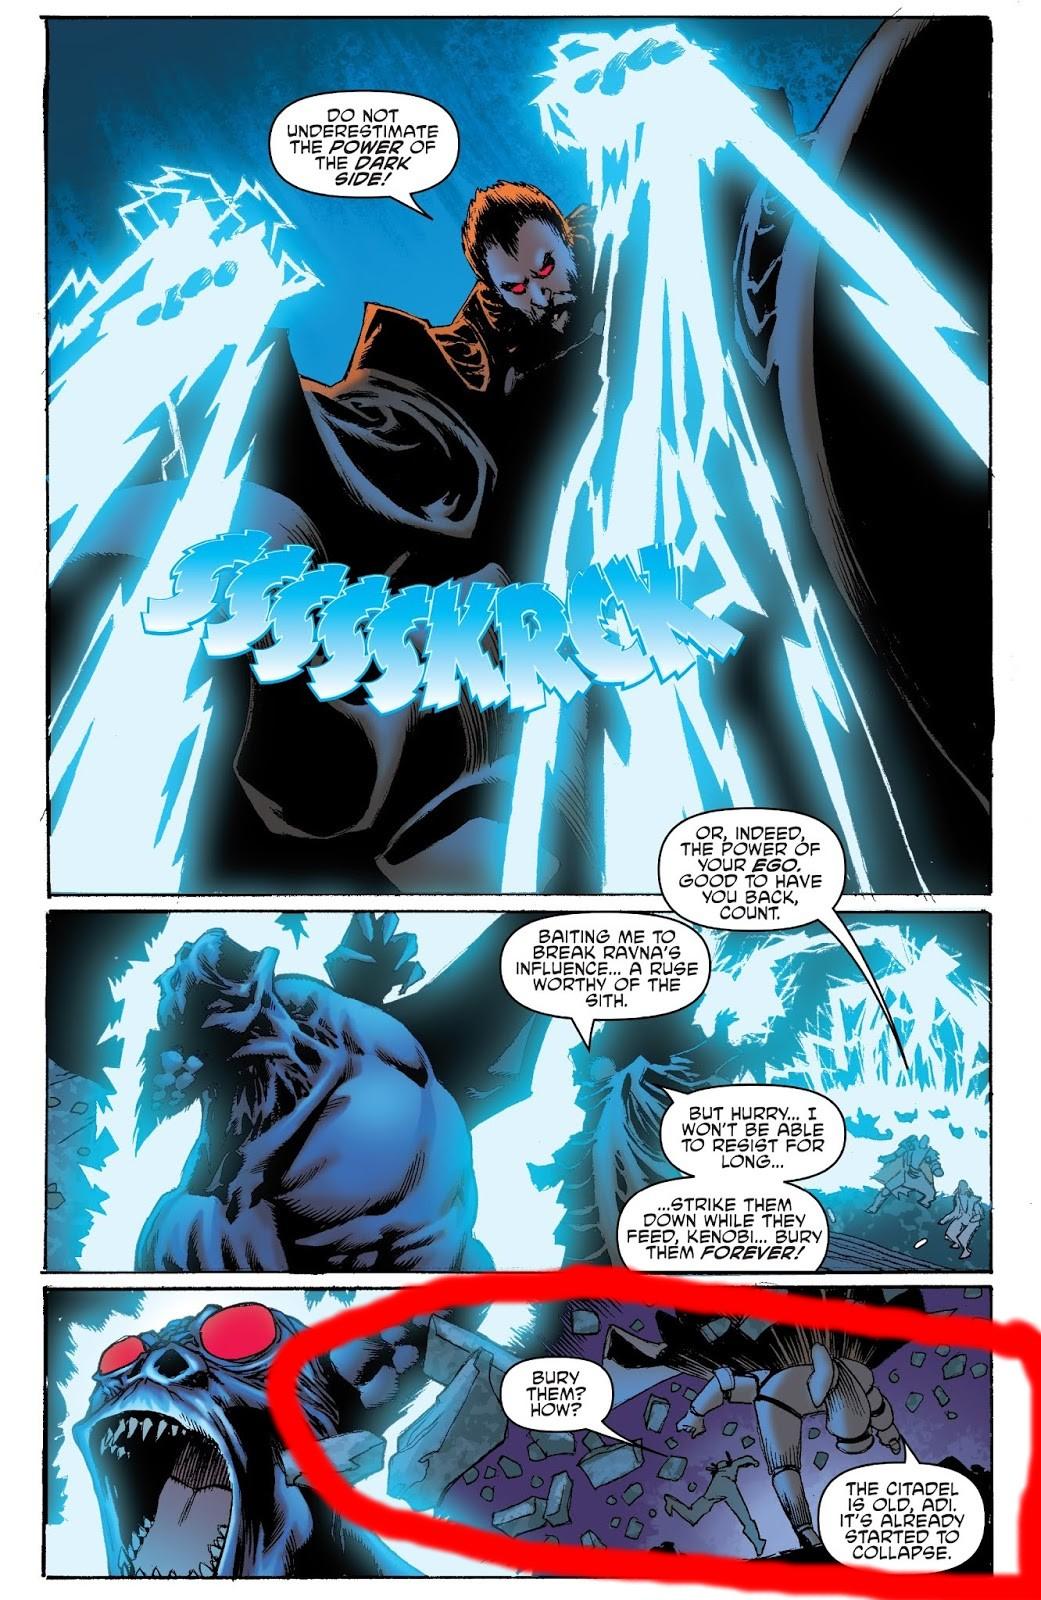 SS - Darth Tyranus (BreakofDawn) vs Darth Vader (Shioz) - Page 2 5UHgOA4Hvv10Y6Cks0fqv0QQwyA0ylsOSzQUZzQFeBioAs7BXpmHJbUrCEC-l9C_vcMzI66nG1oO8f7lfKMpyIUCXfD9ooazgRAv96I3w_ydCrrkNC_Y8wcgCzTS-IydeRvSZ8X5